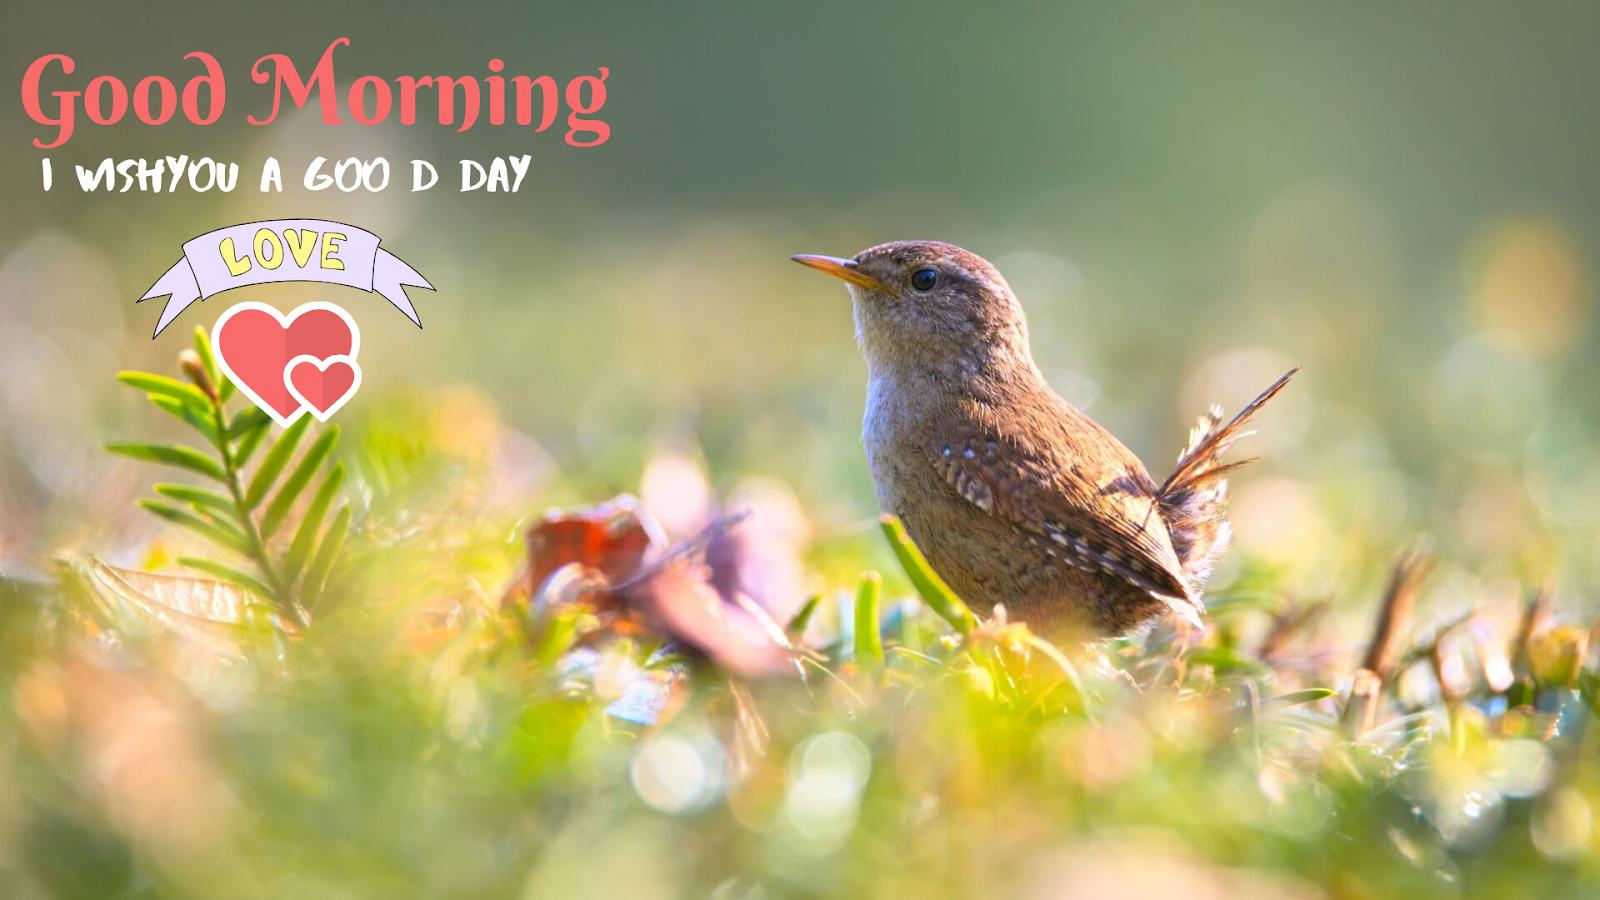 Fair Little Bird Good Morning image